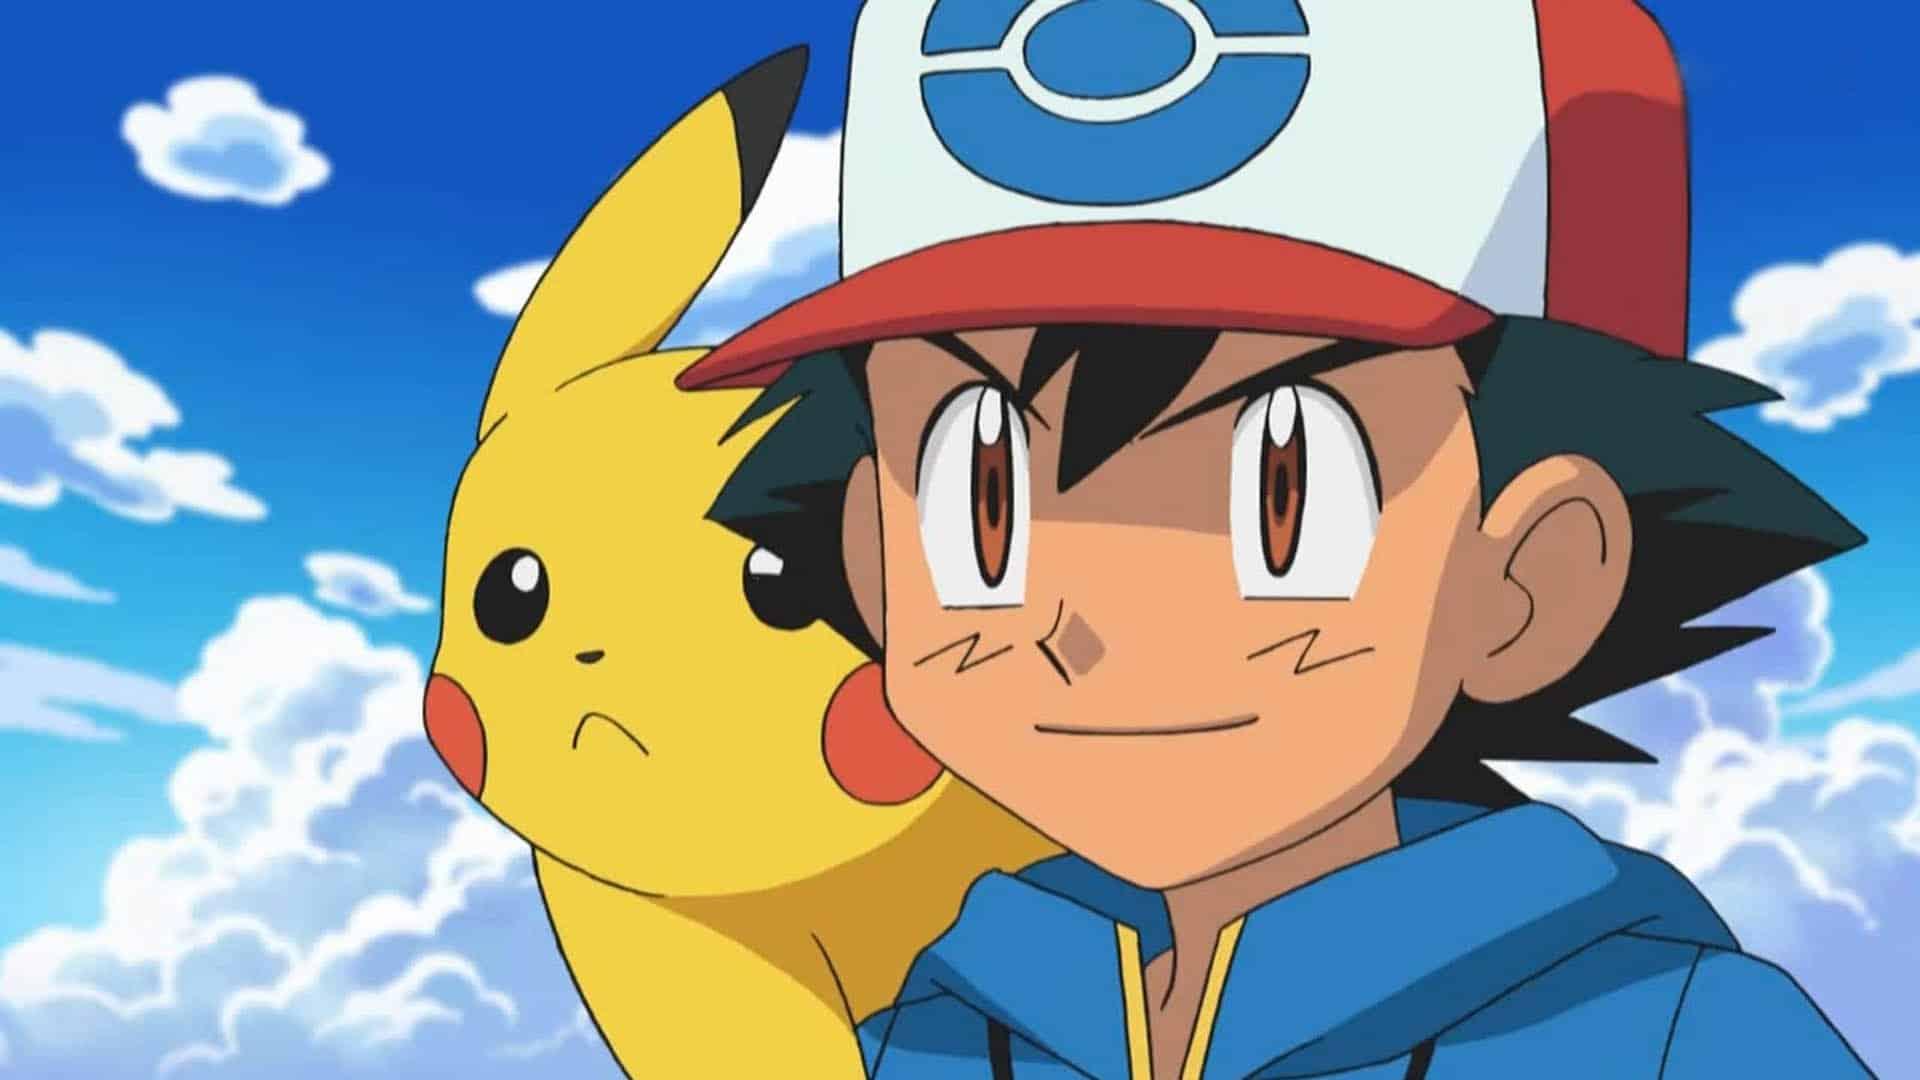 Pikachu Illustrator Rare Pokemon Card Pokemon Cards